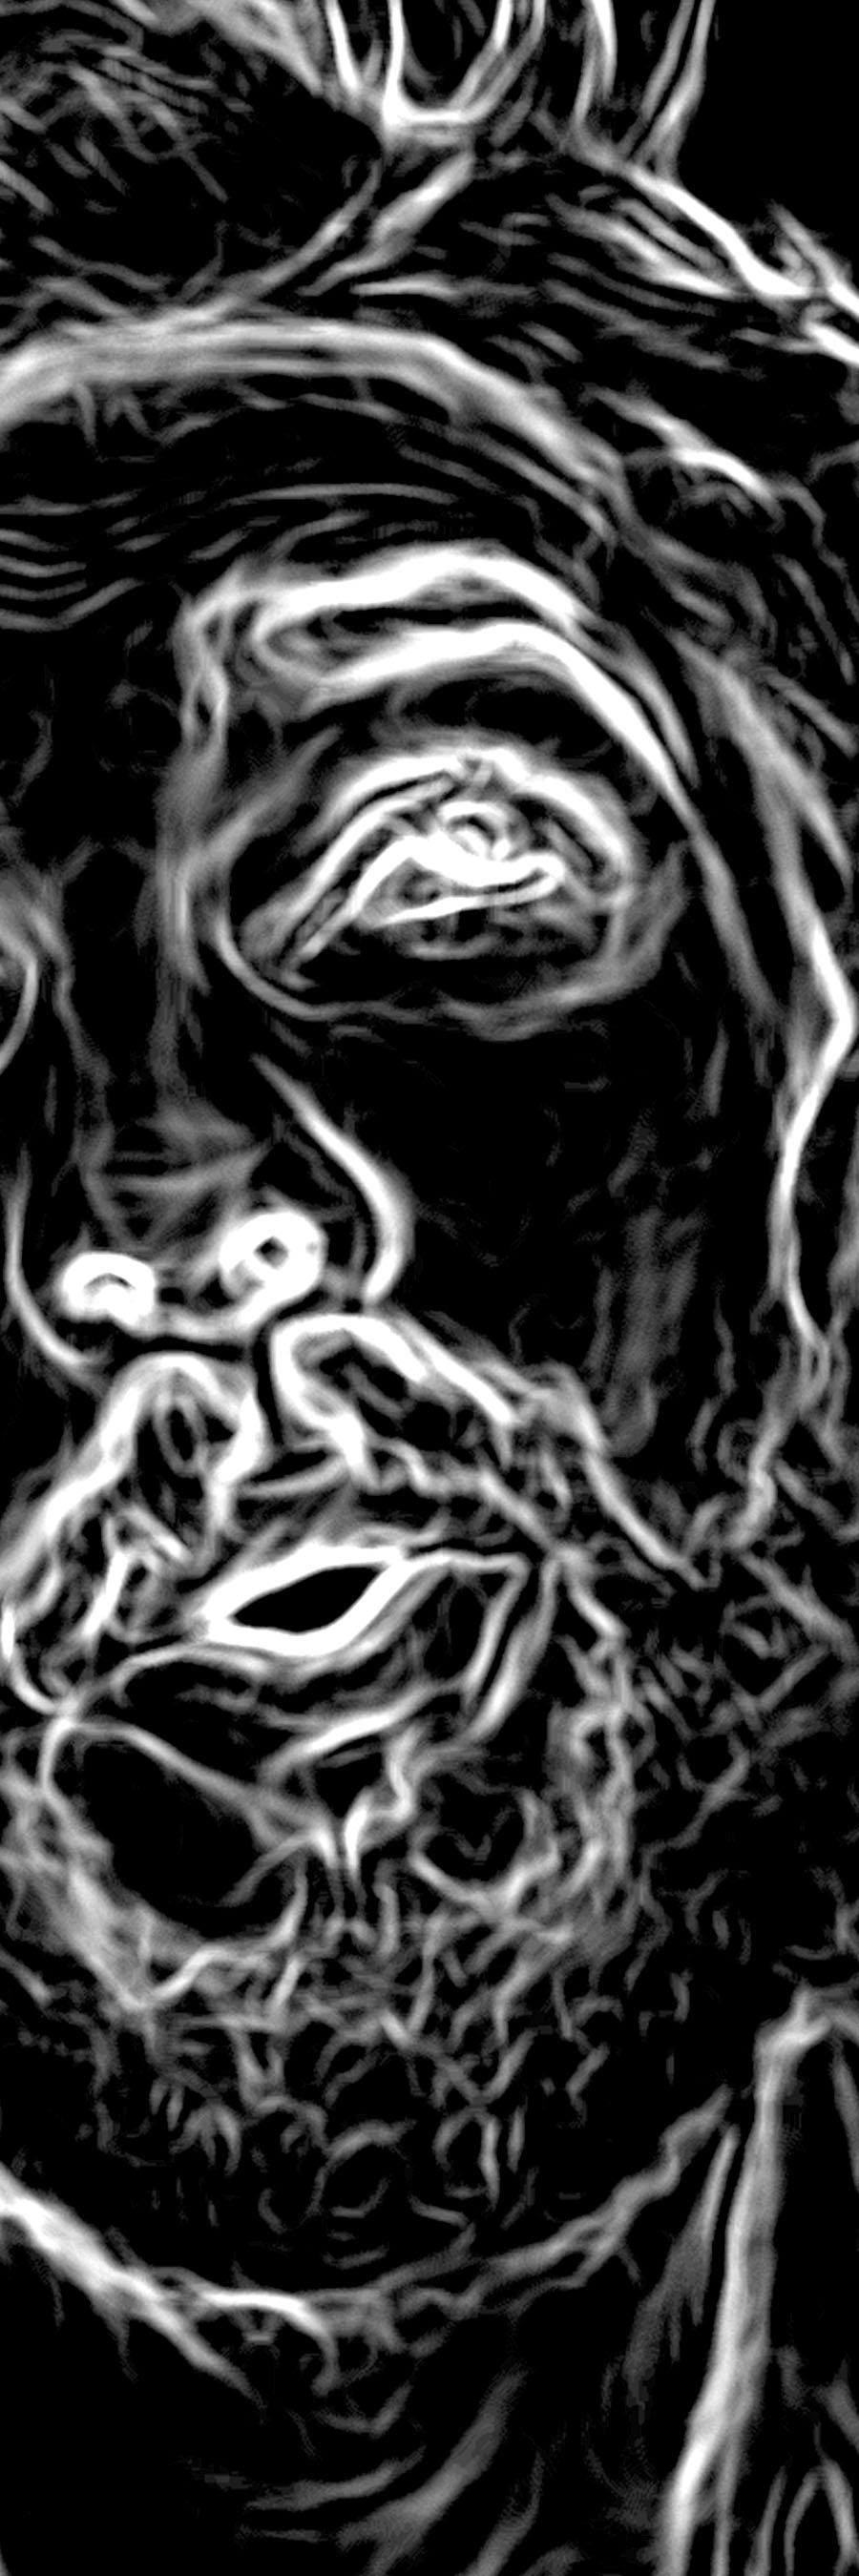 Famous Expressive Line Art : Expressive line black by redghostman on deviantart